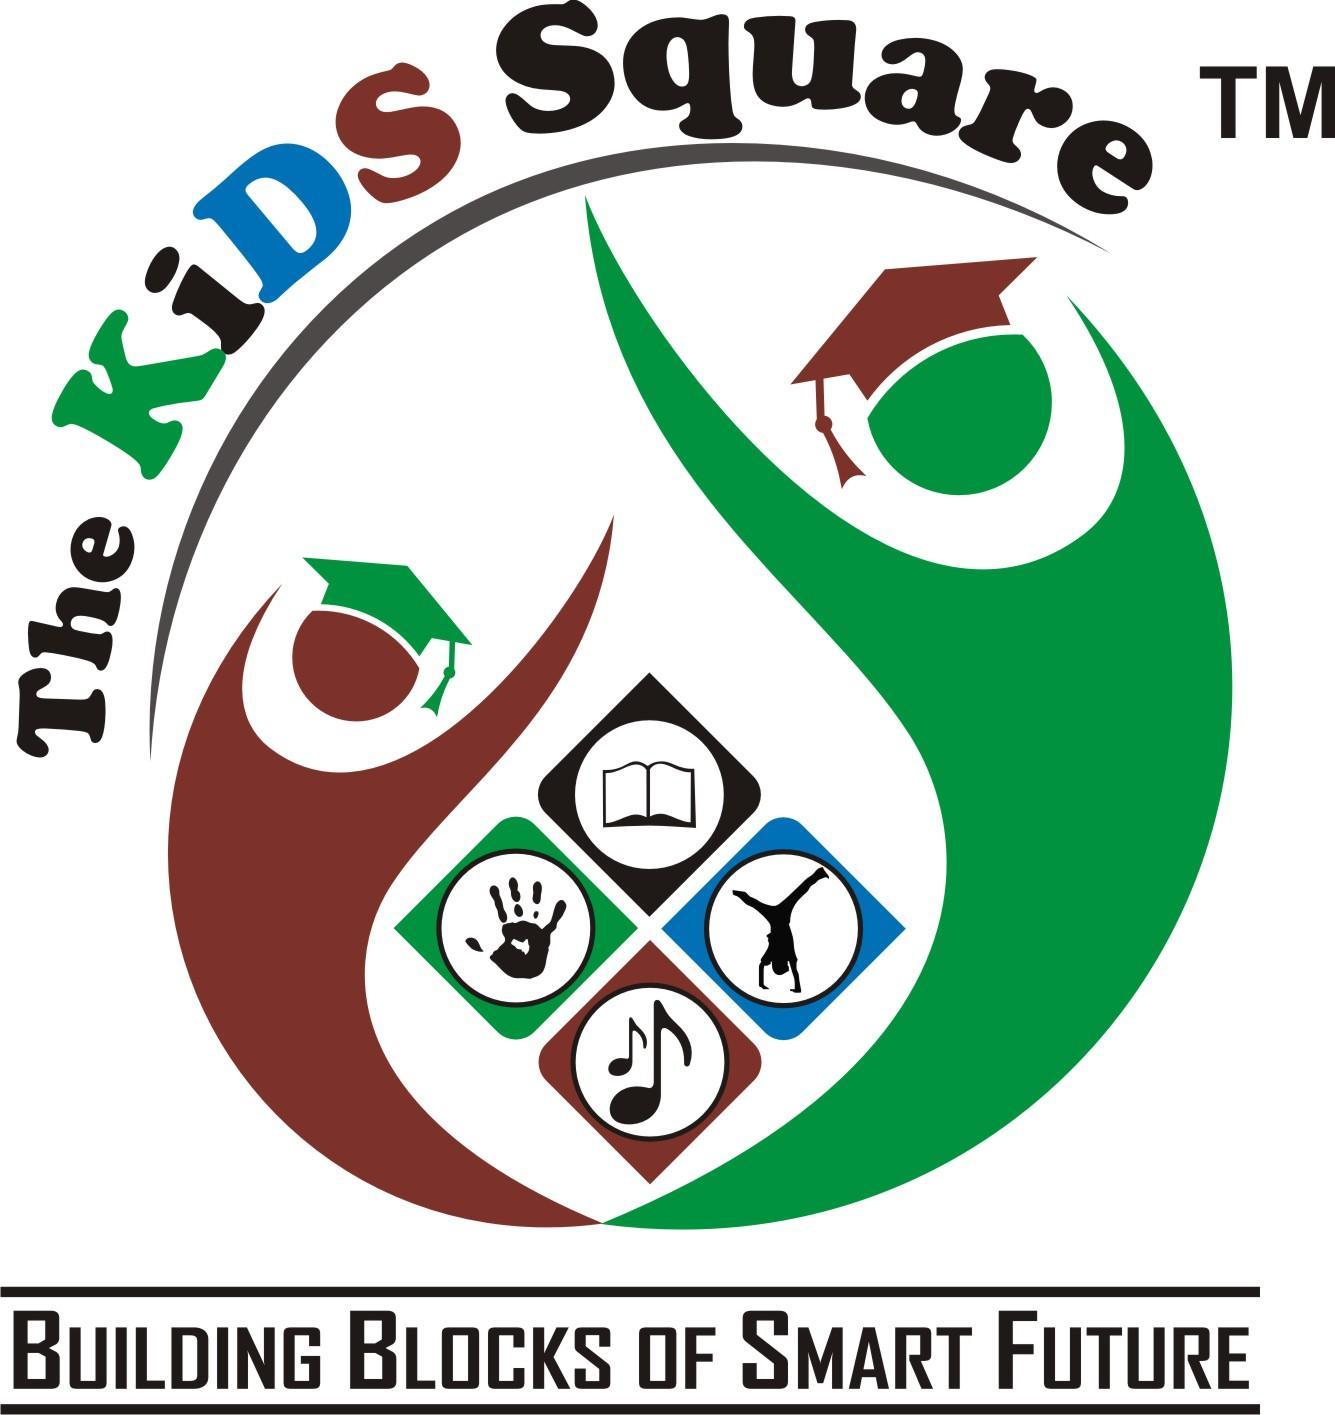 The Kids Square Island, The Kids Square Island